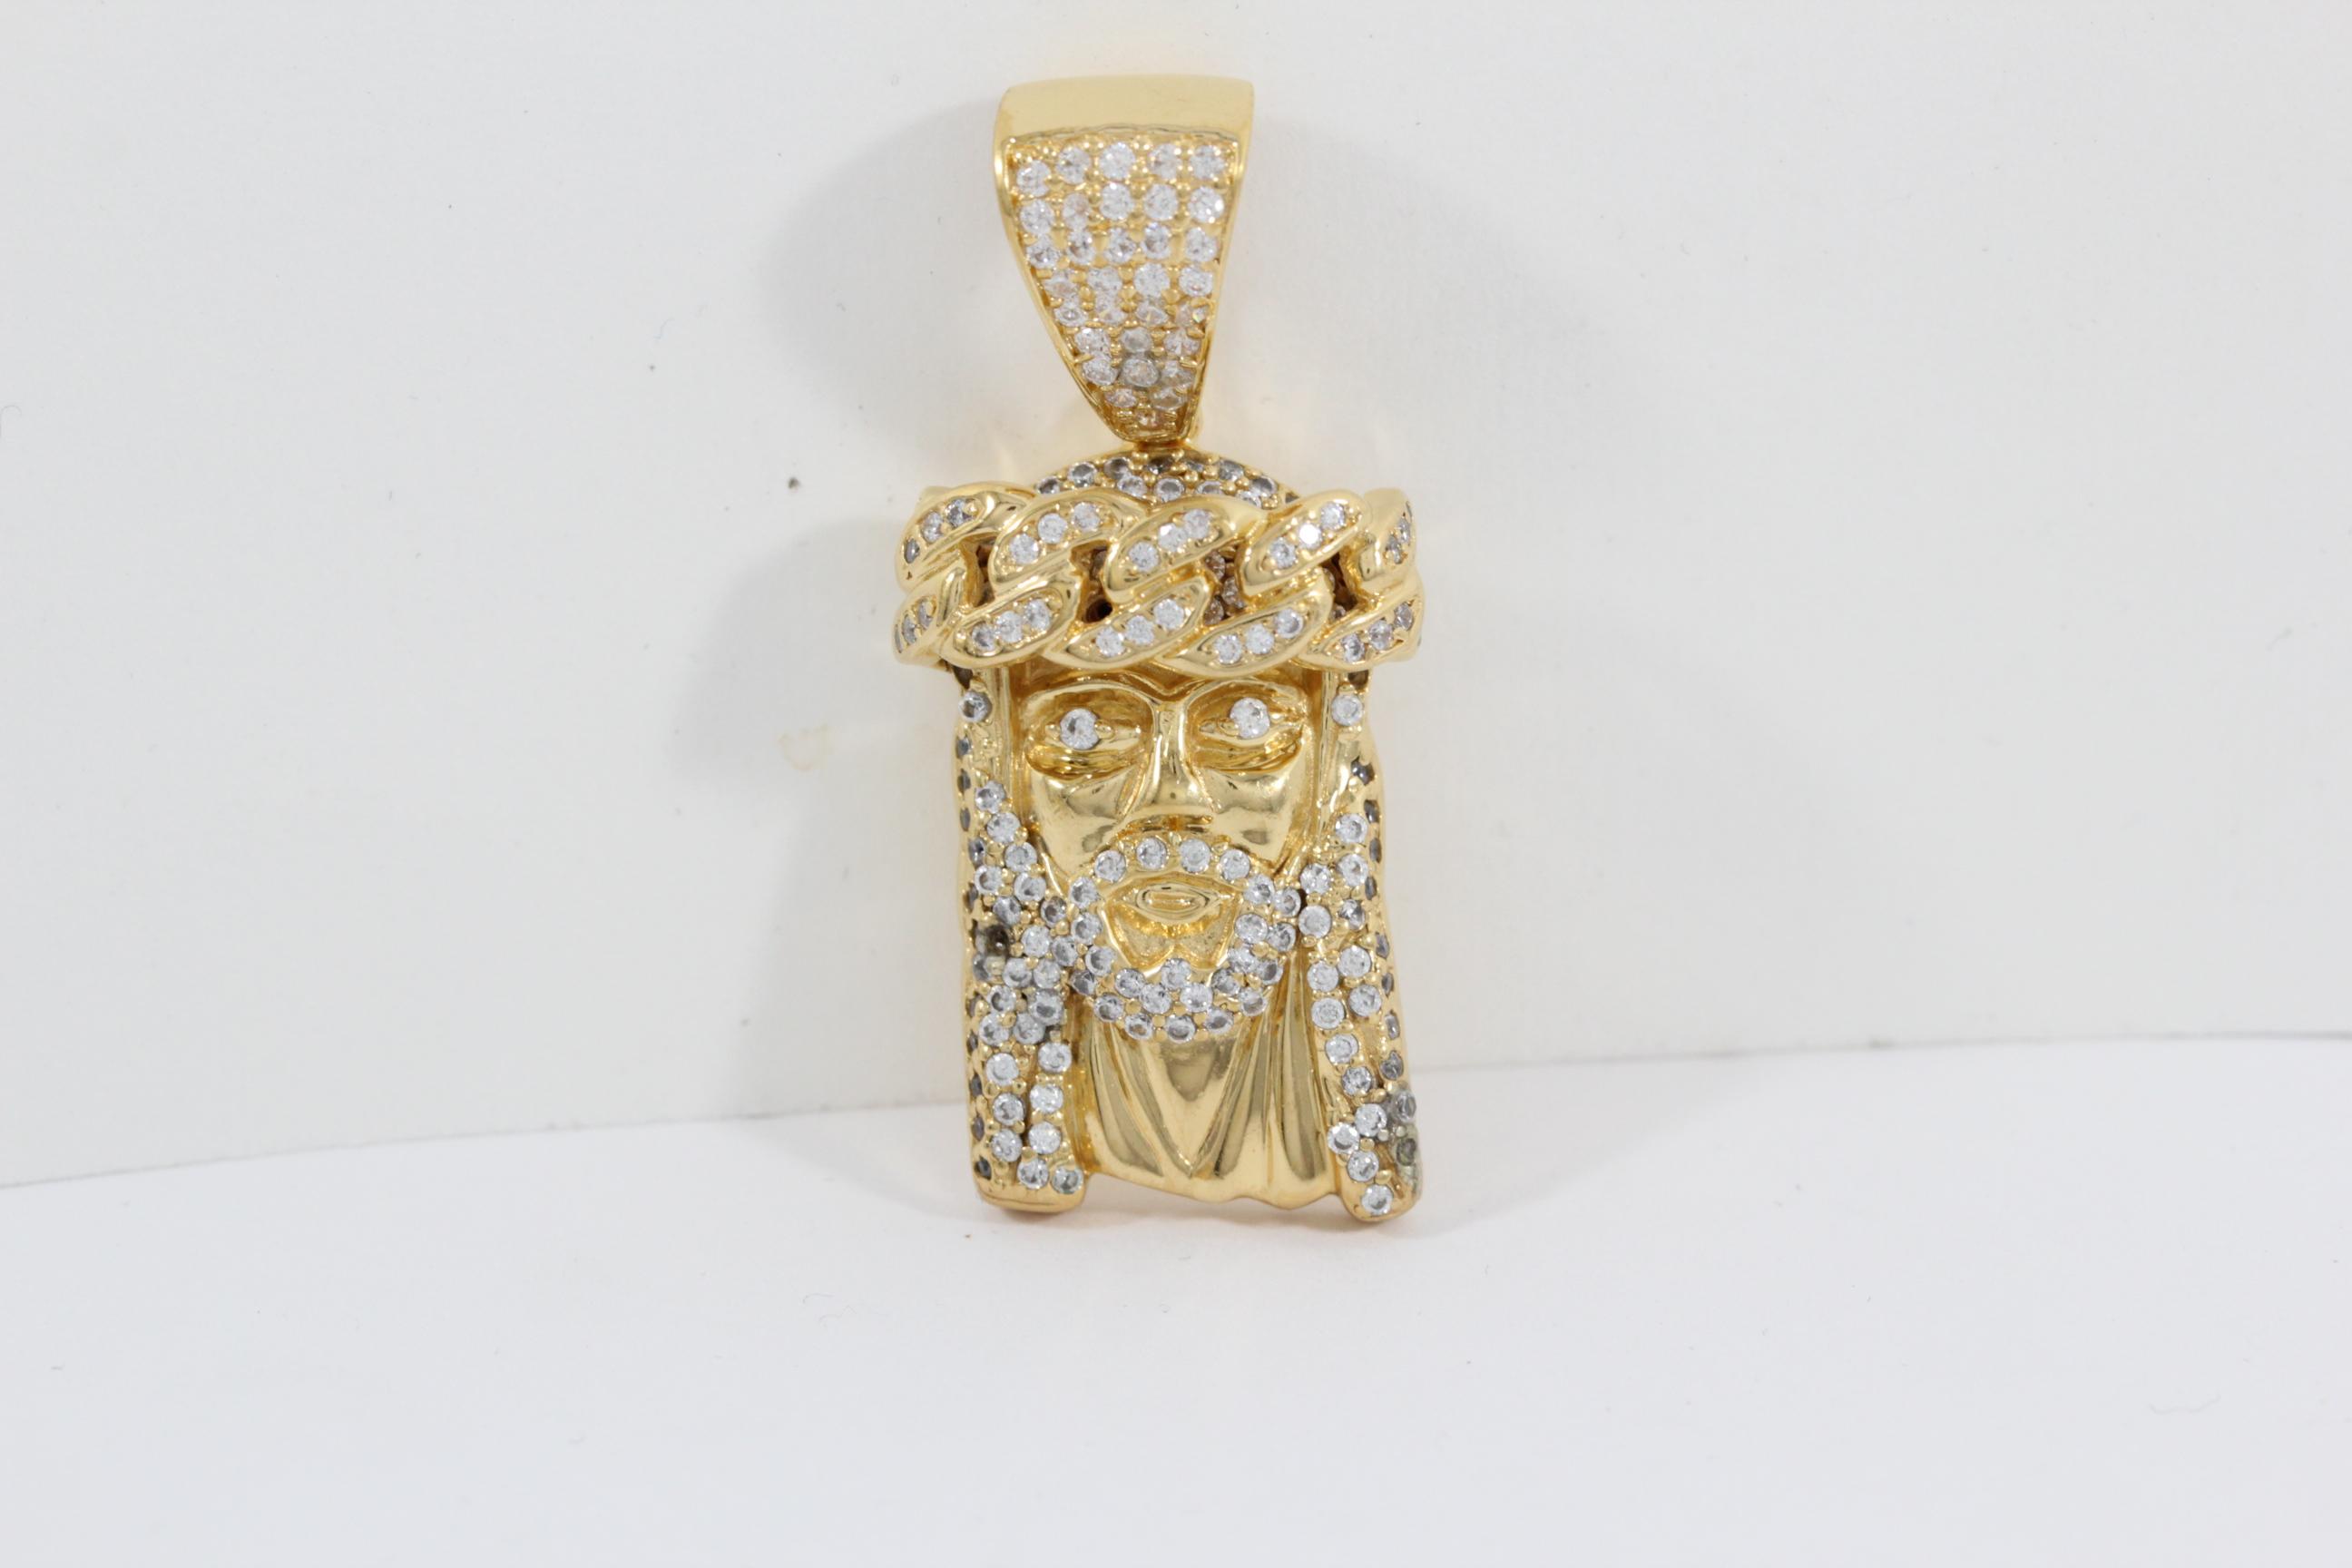 clean-tarnished-jewelry-rhinestone